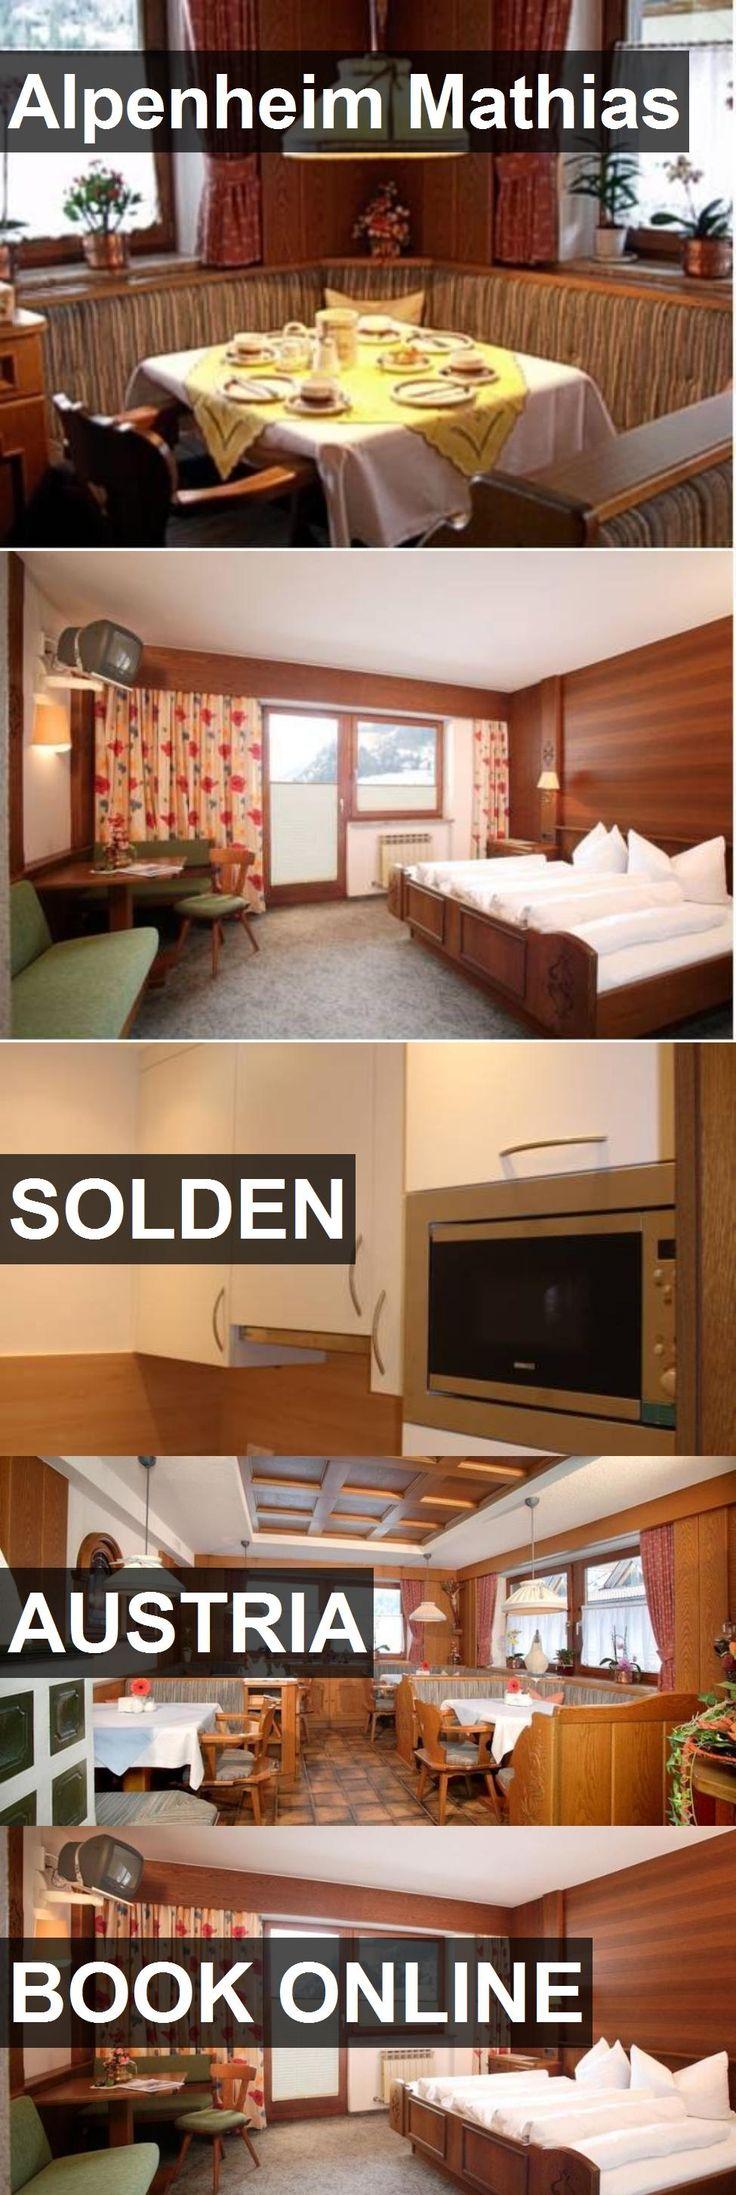 Hotel Alpenheim Mathias in Solden, Austria. For more information, photos, reviews and best prices please follow the link. #Austria #Solden #AlpenheimMathias #hotel #travel #vacation